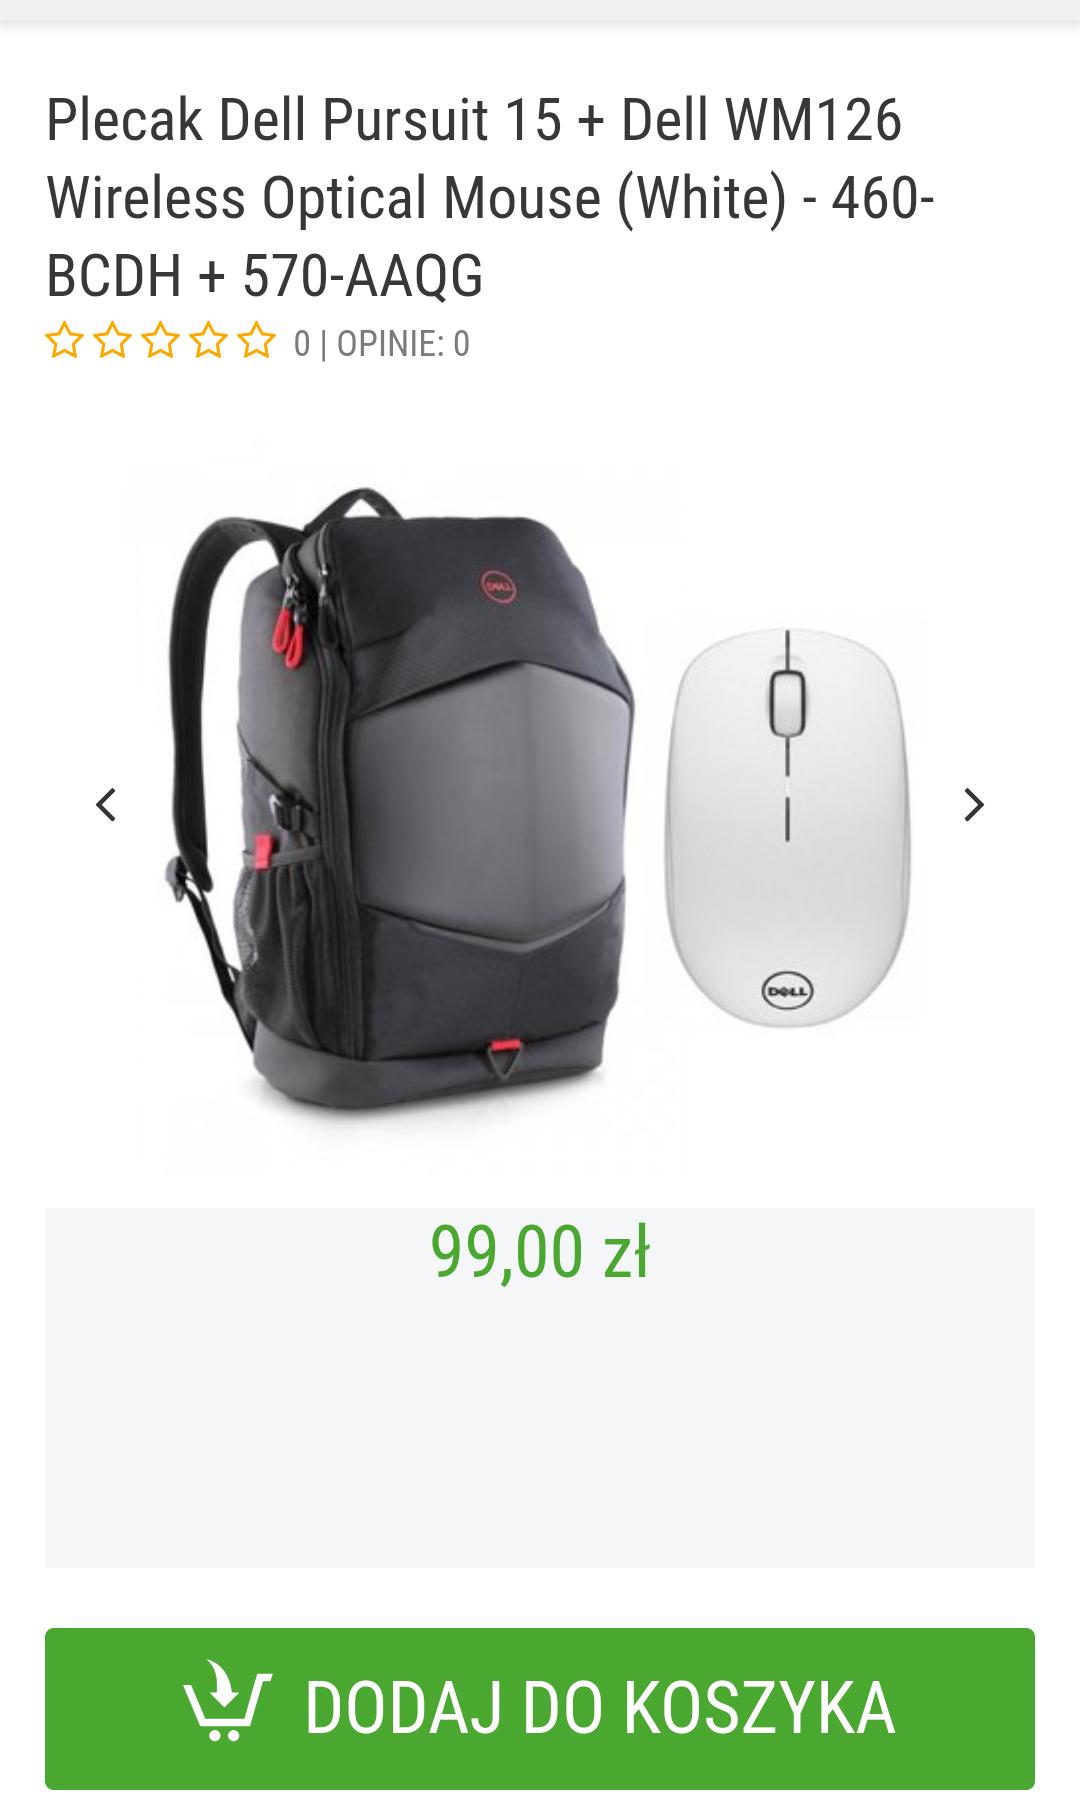 Plecak Dell Pursuit 15 + myszka Dell WM126 / Sferis